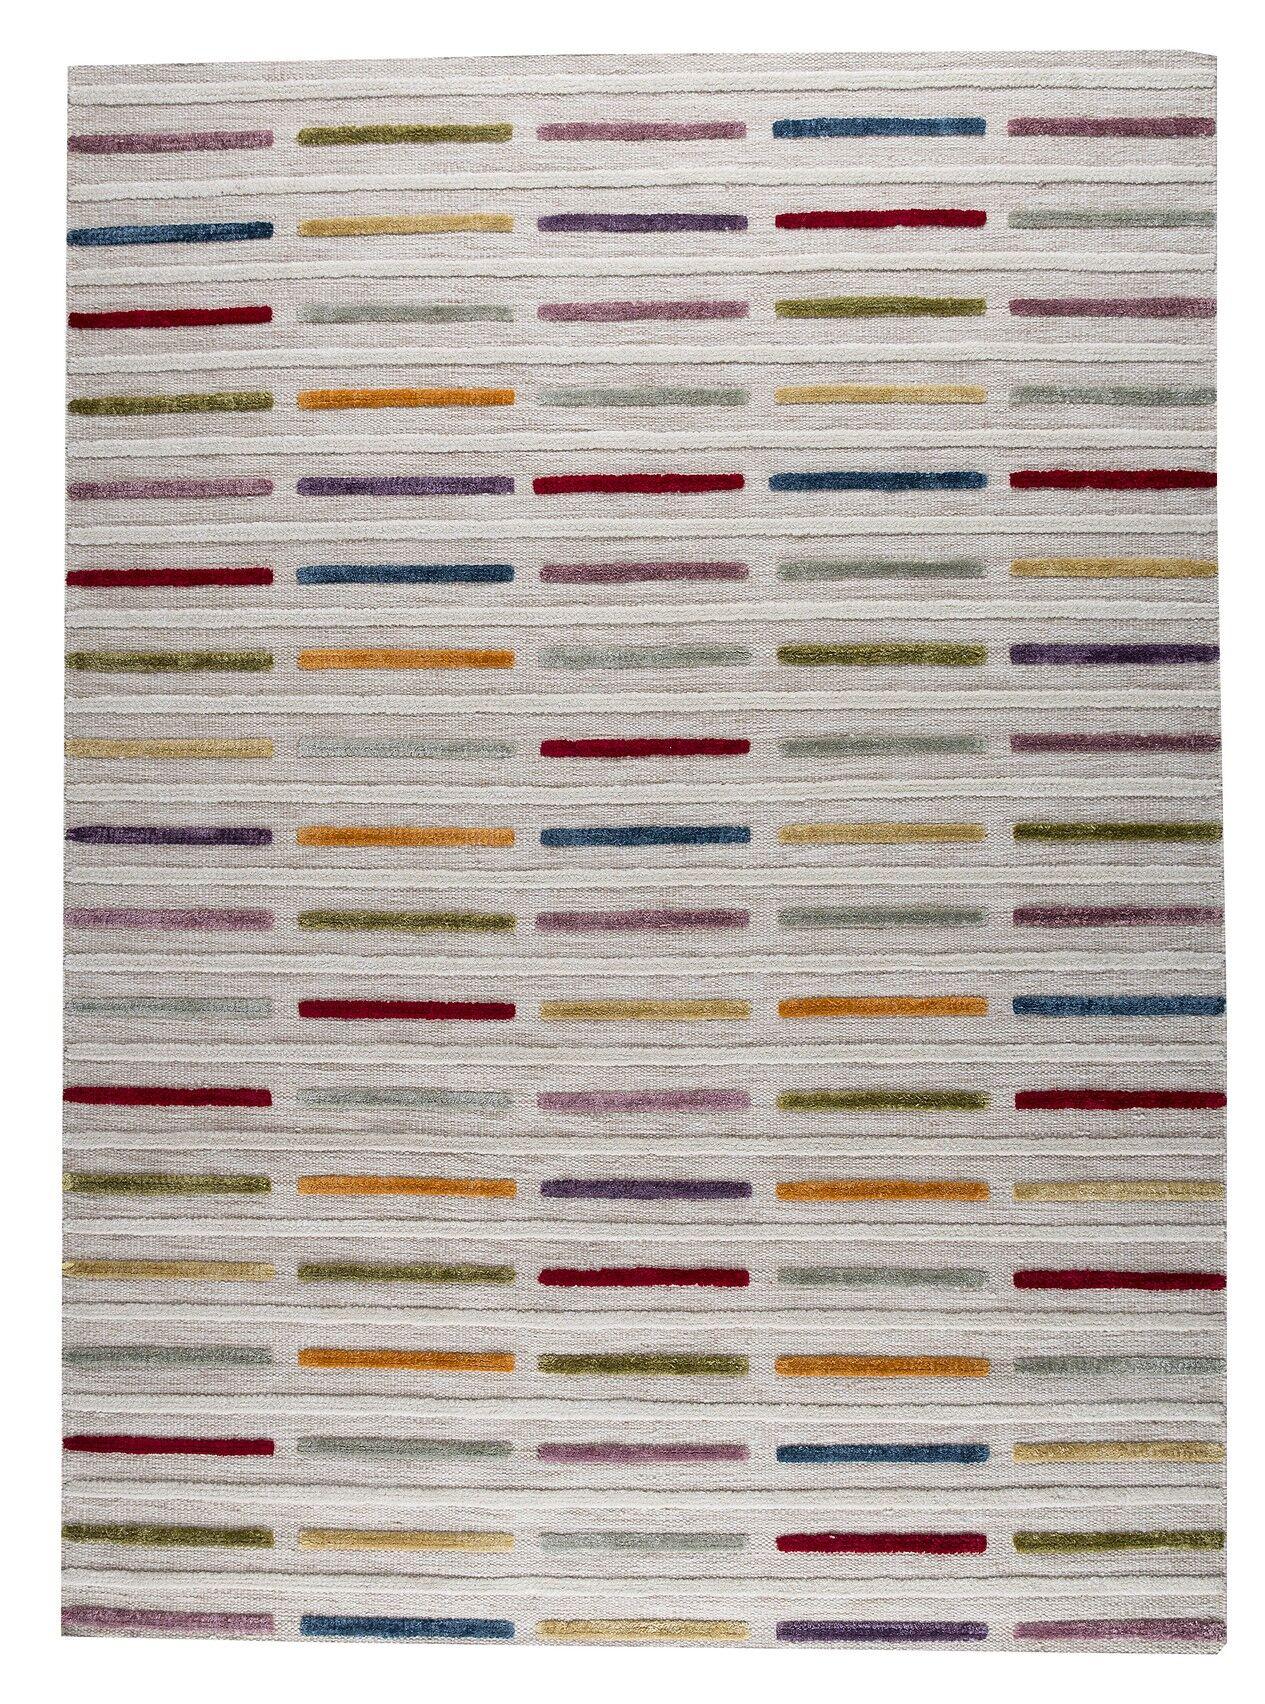 Khema 5 Hand-Woven Gray/Purple/Yellow Area Rug Rug Size: 4'6